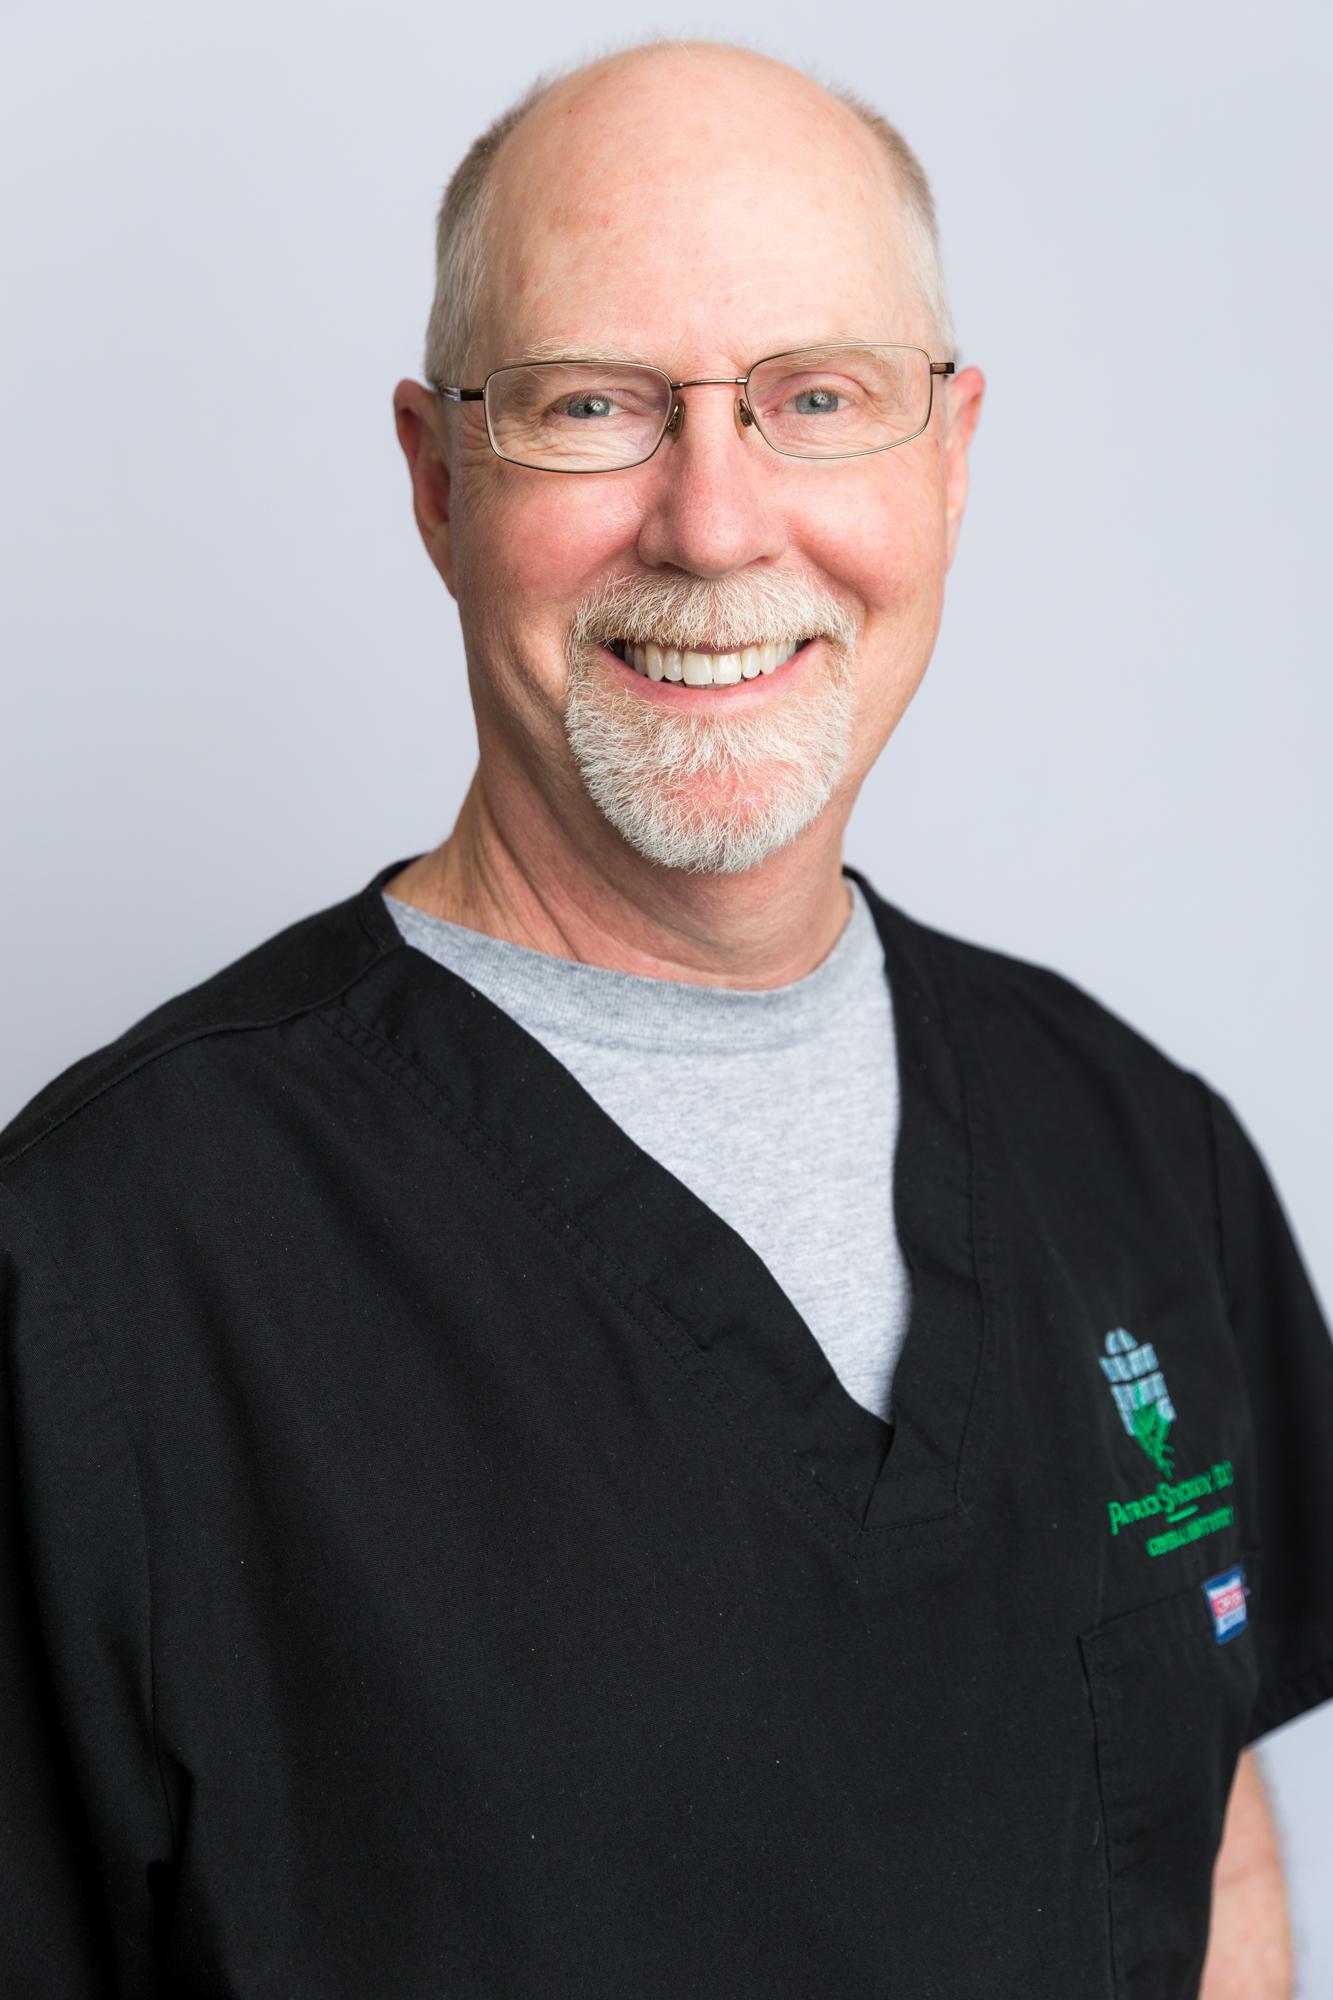 Headshot of Dr. Stuckey